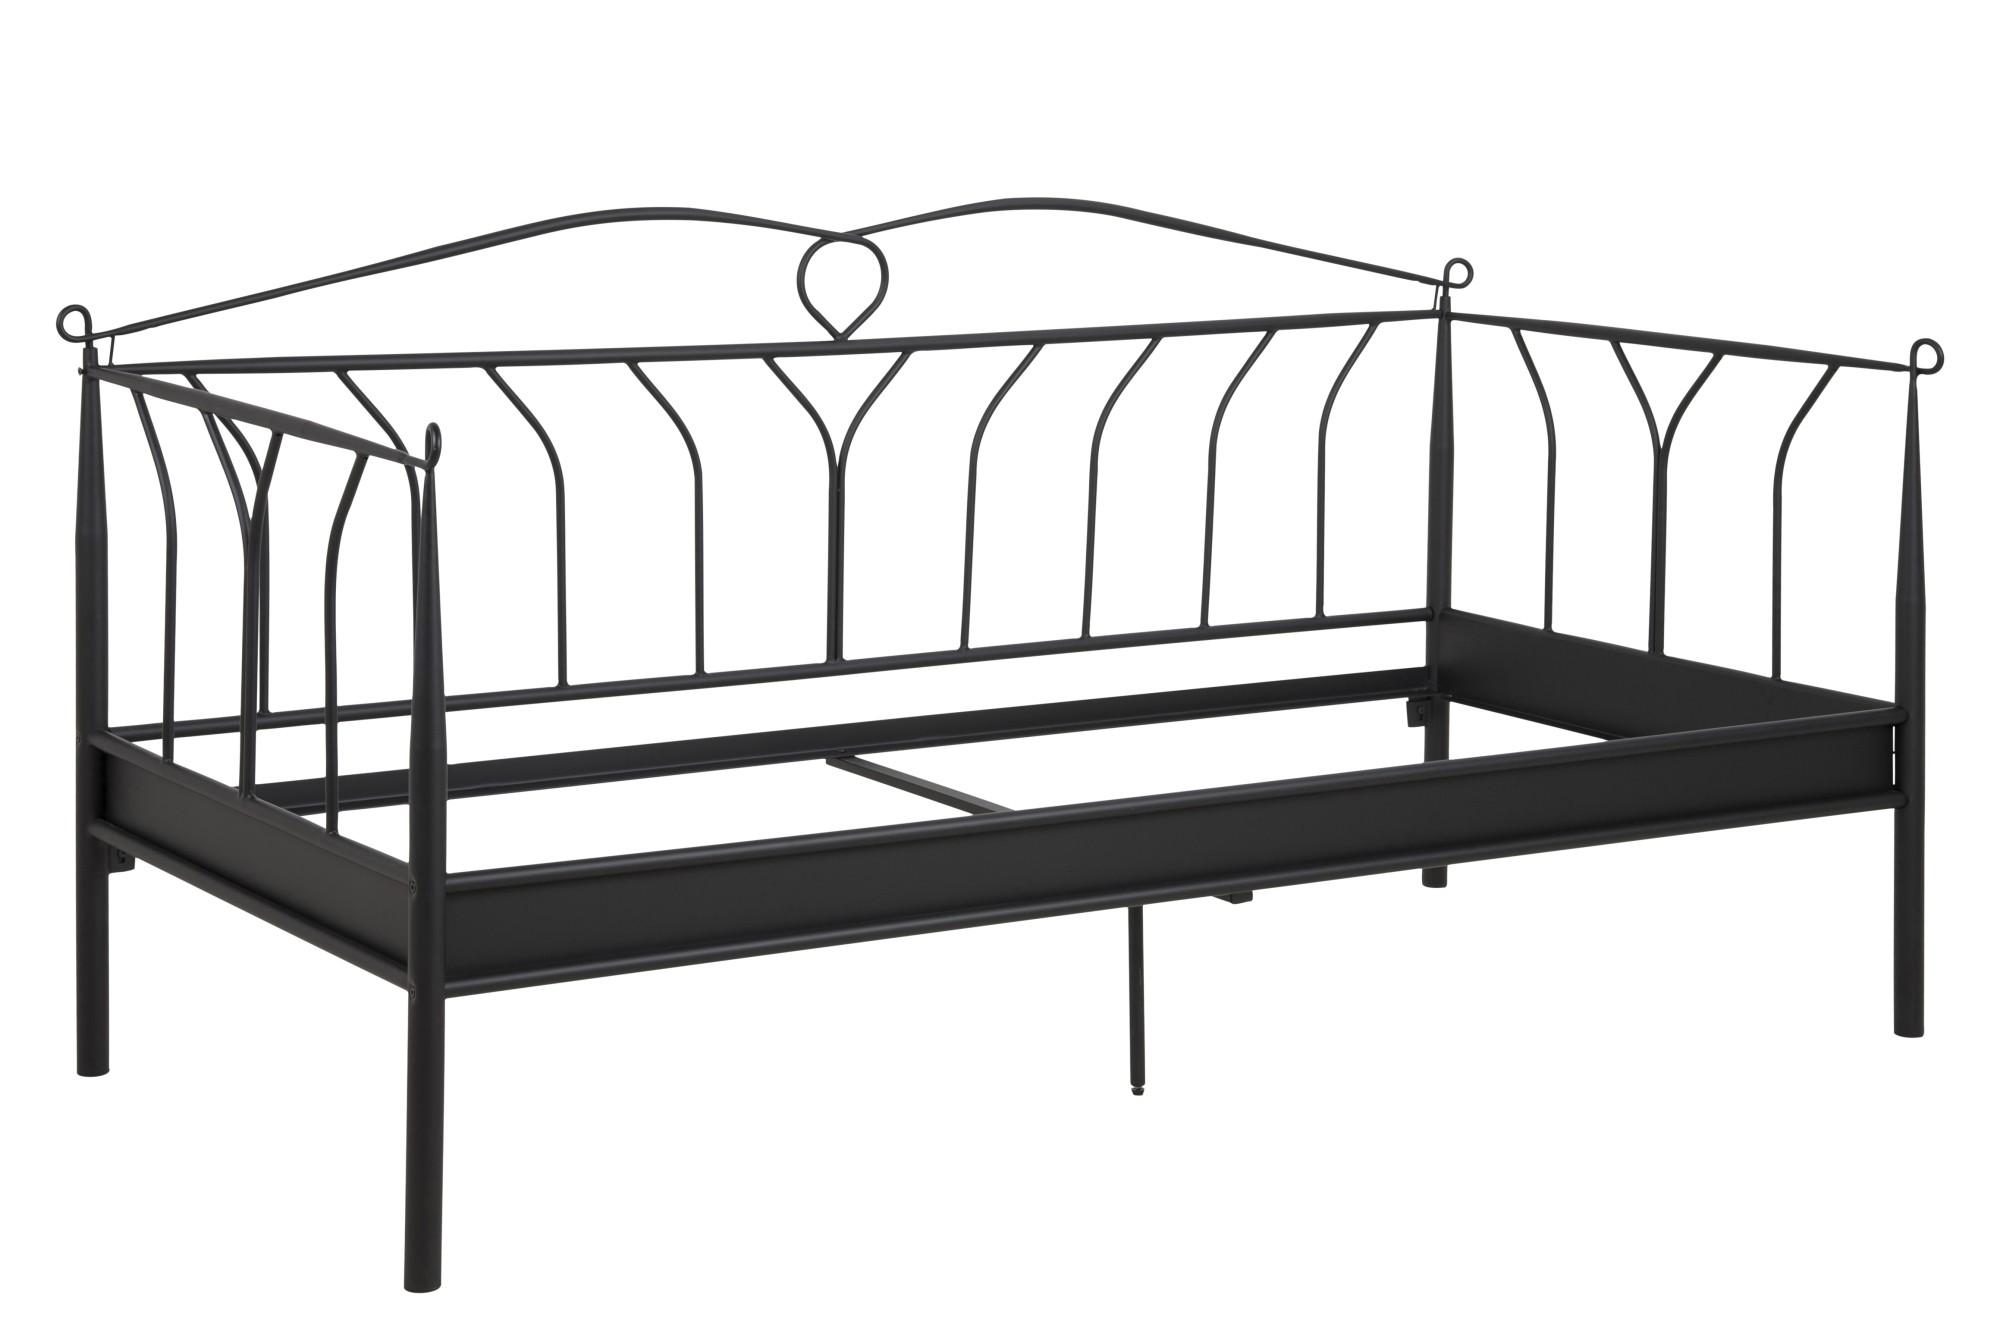 Full Size of Metall Bett Lissy 200x90 Schwarz Bettgestell Ehebett Schlafzimmer 140x200 Poco 220 X Mit Stauraum 160x200 Kaufen Günstig 2m Antik 90x200 Lattenrost Betten Bett Metall Bett